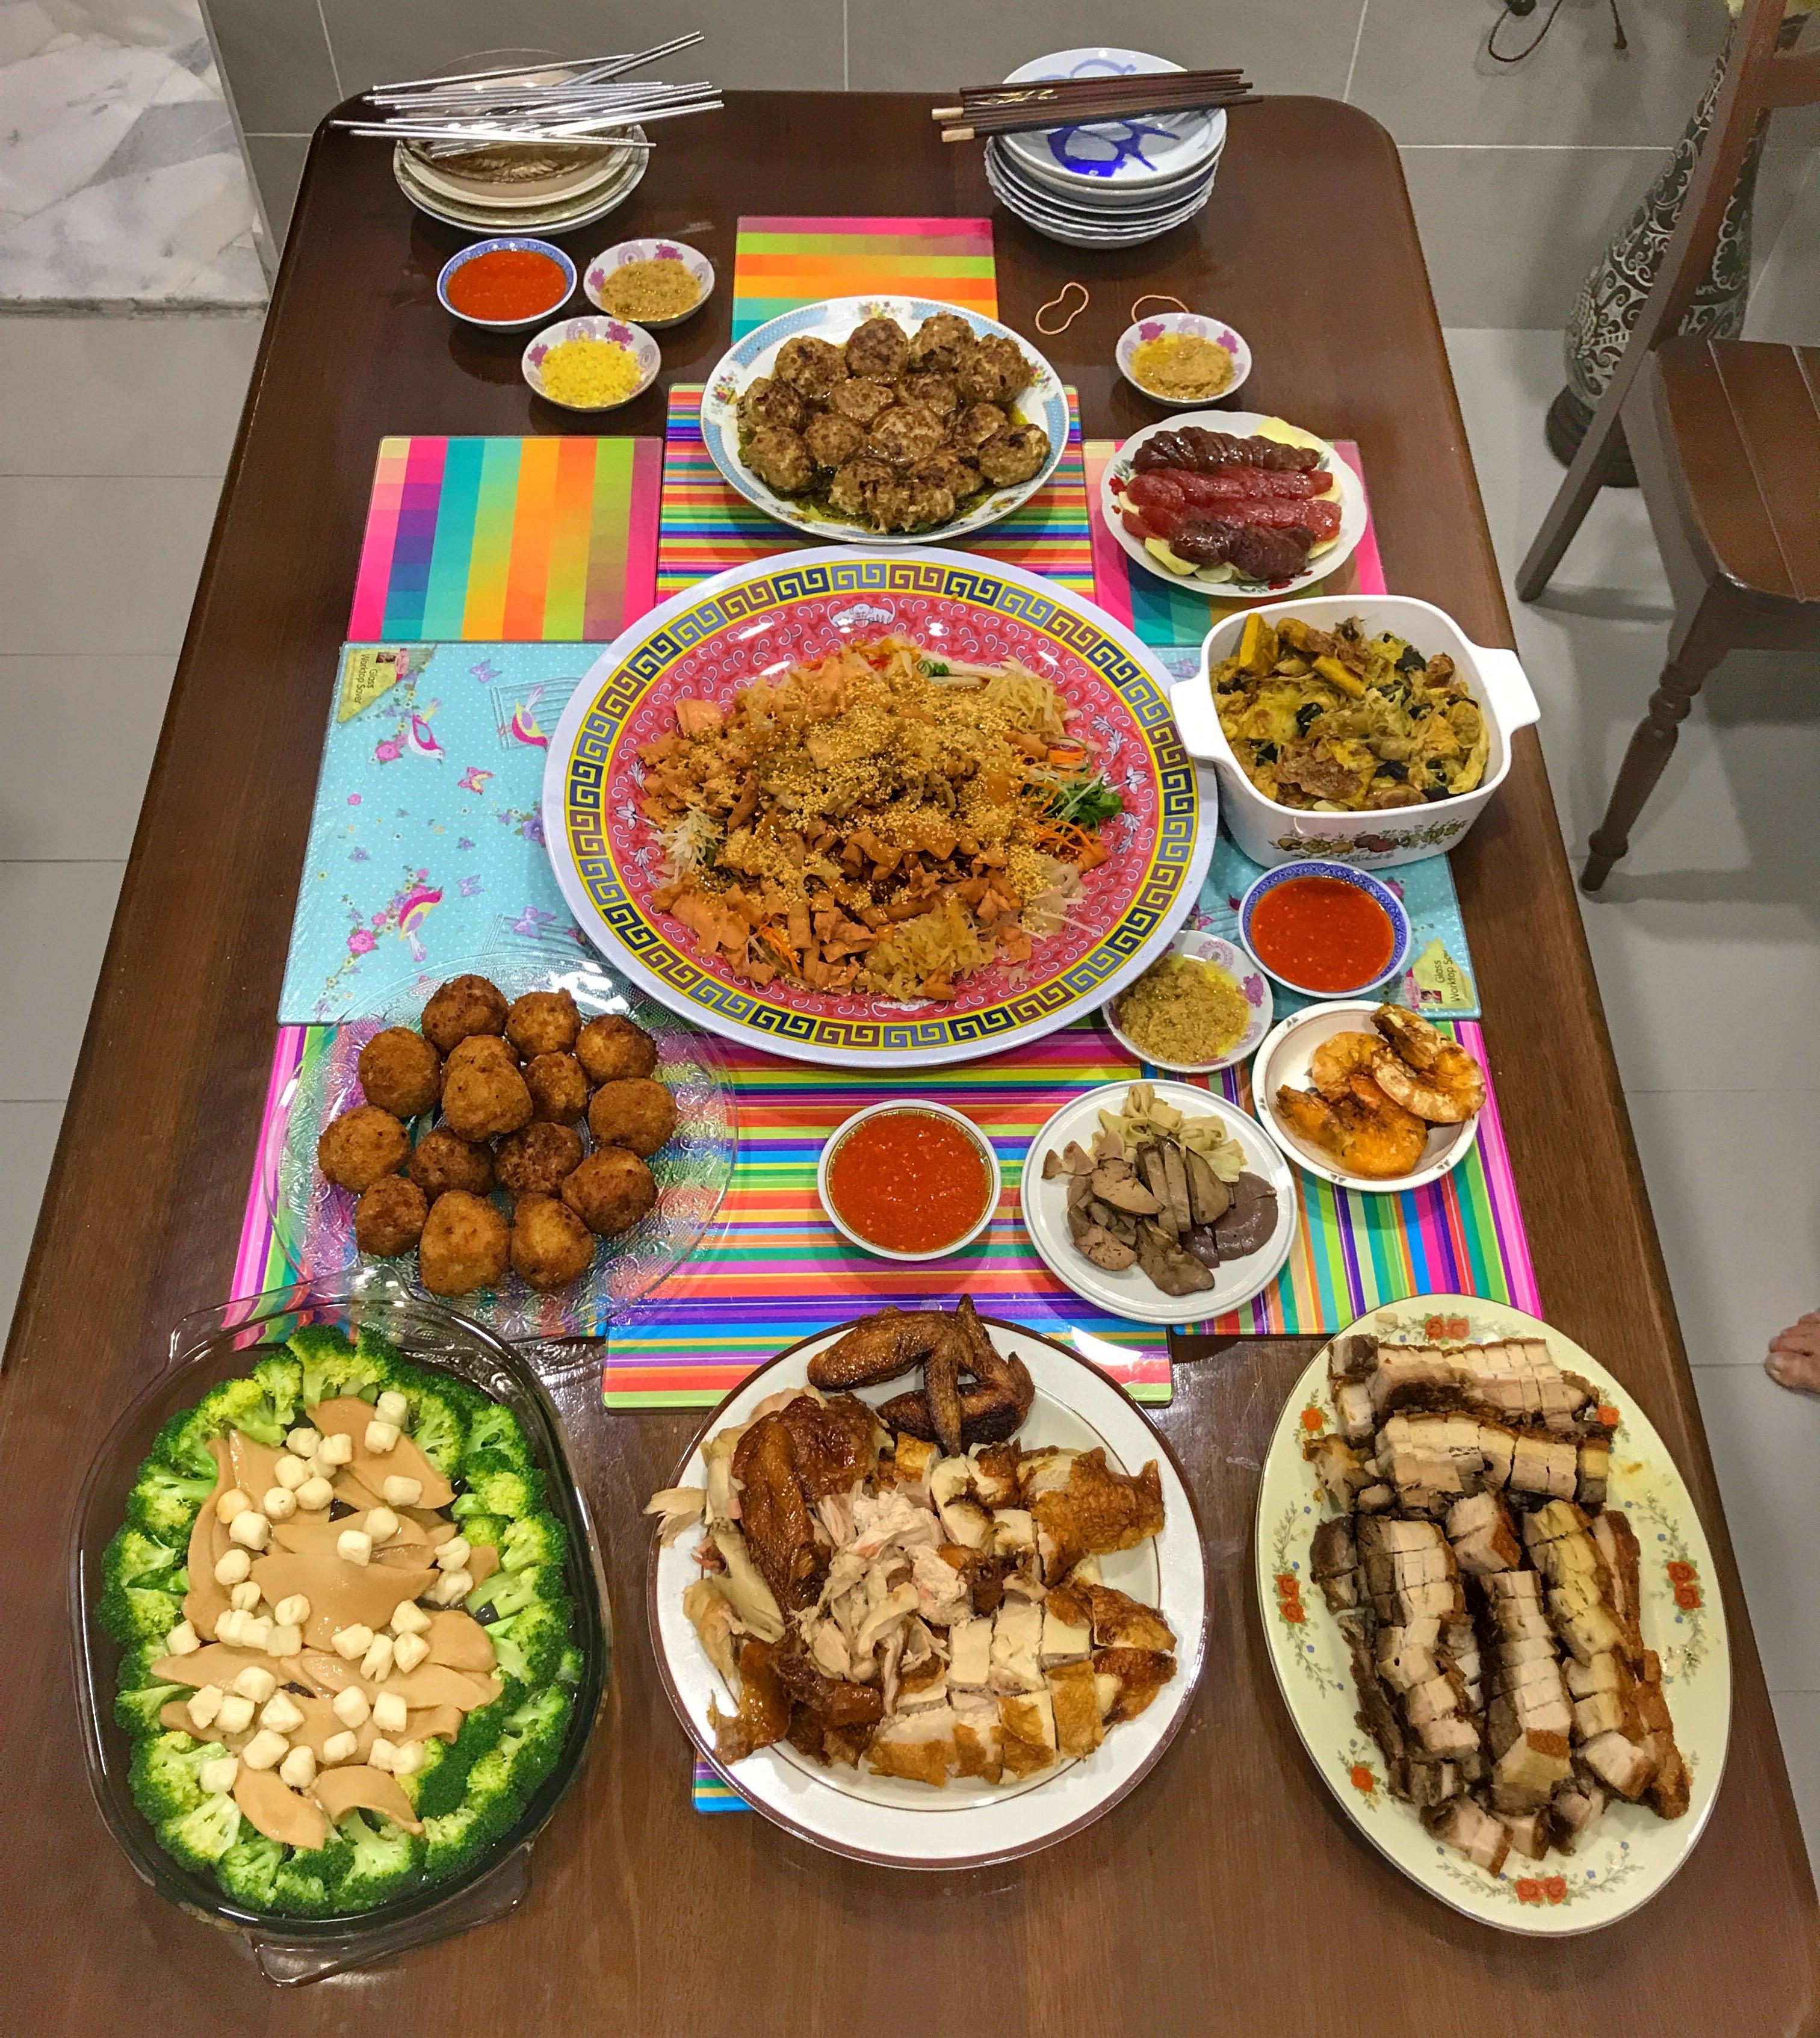 Malaysia 2018 Chinese New Year dinner